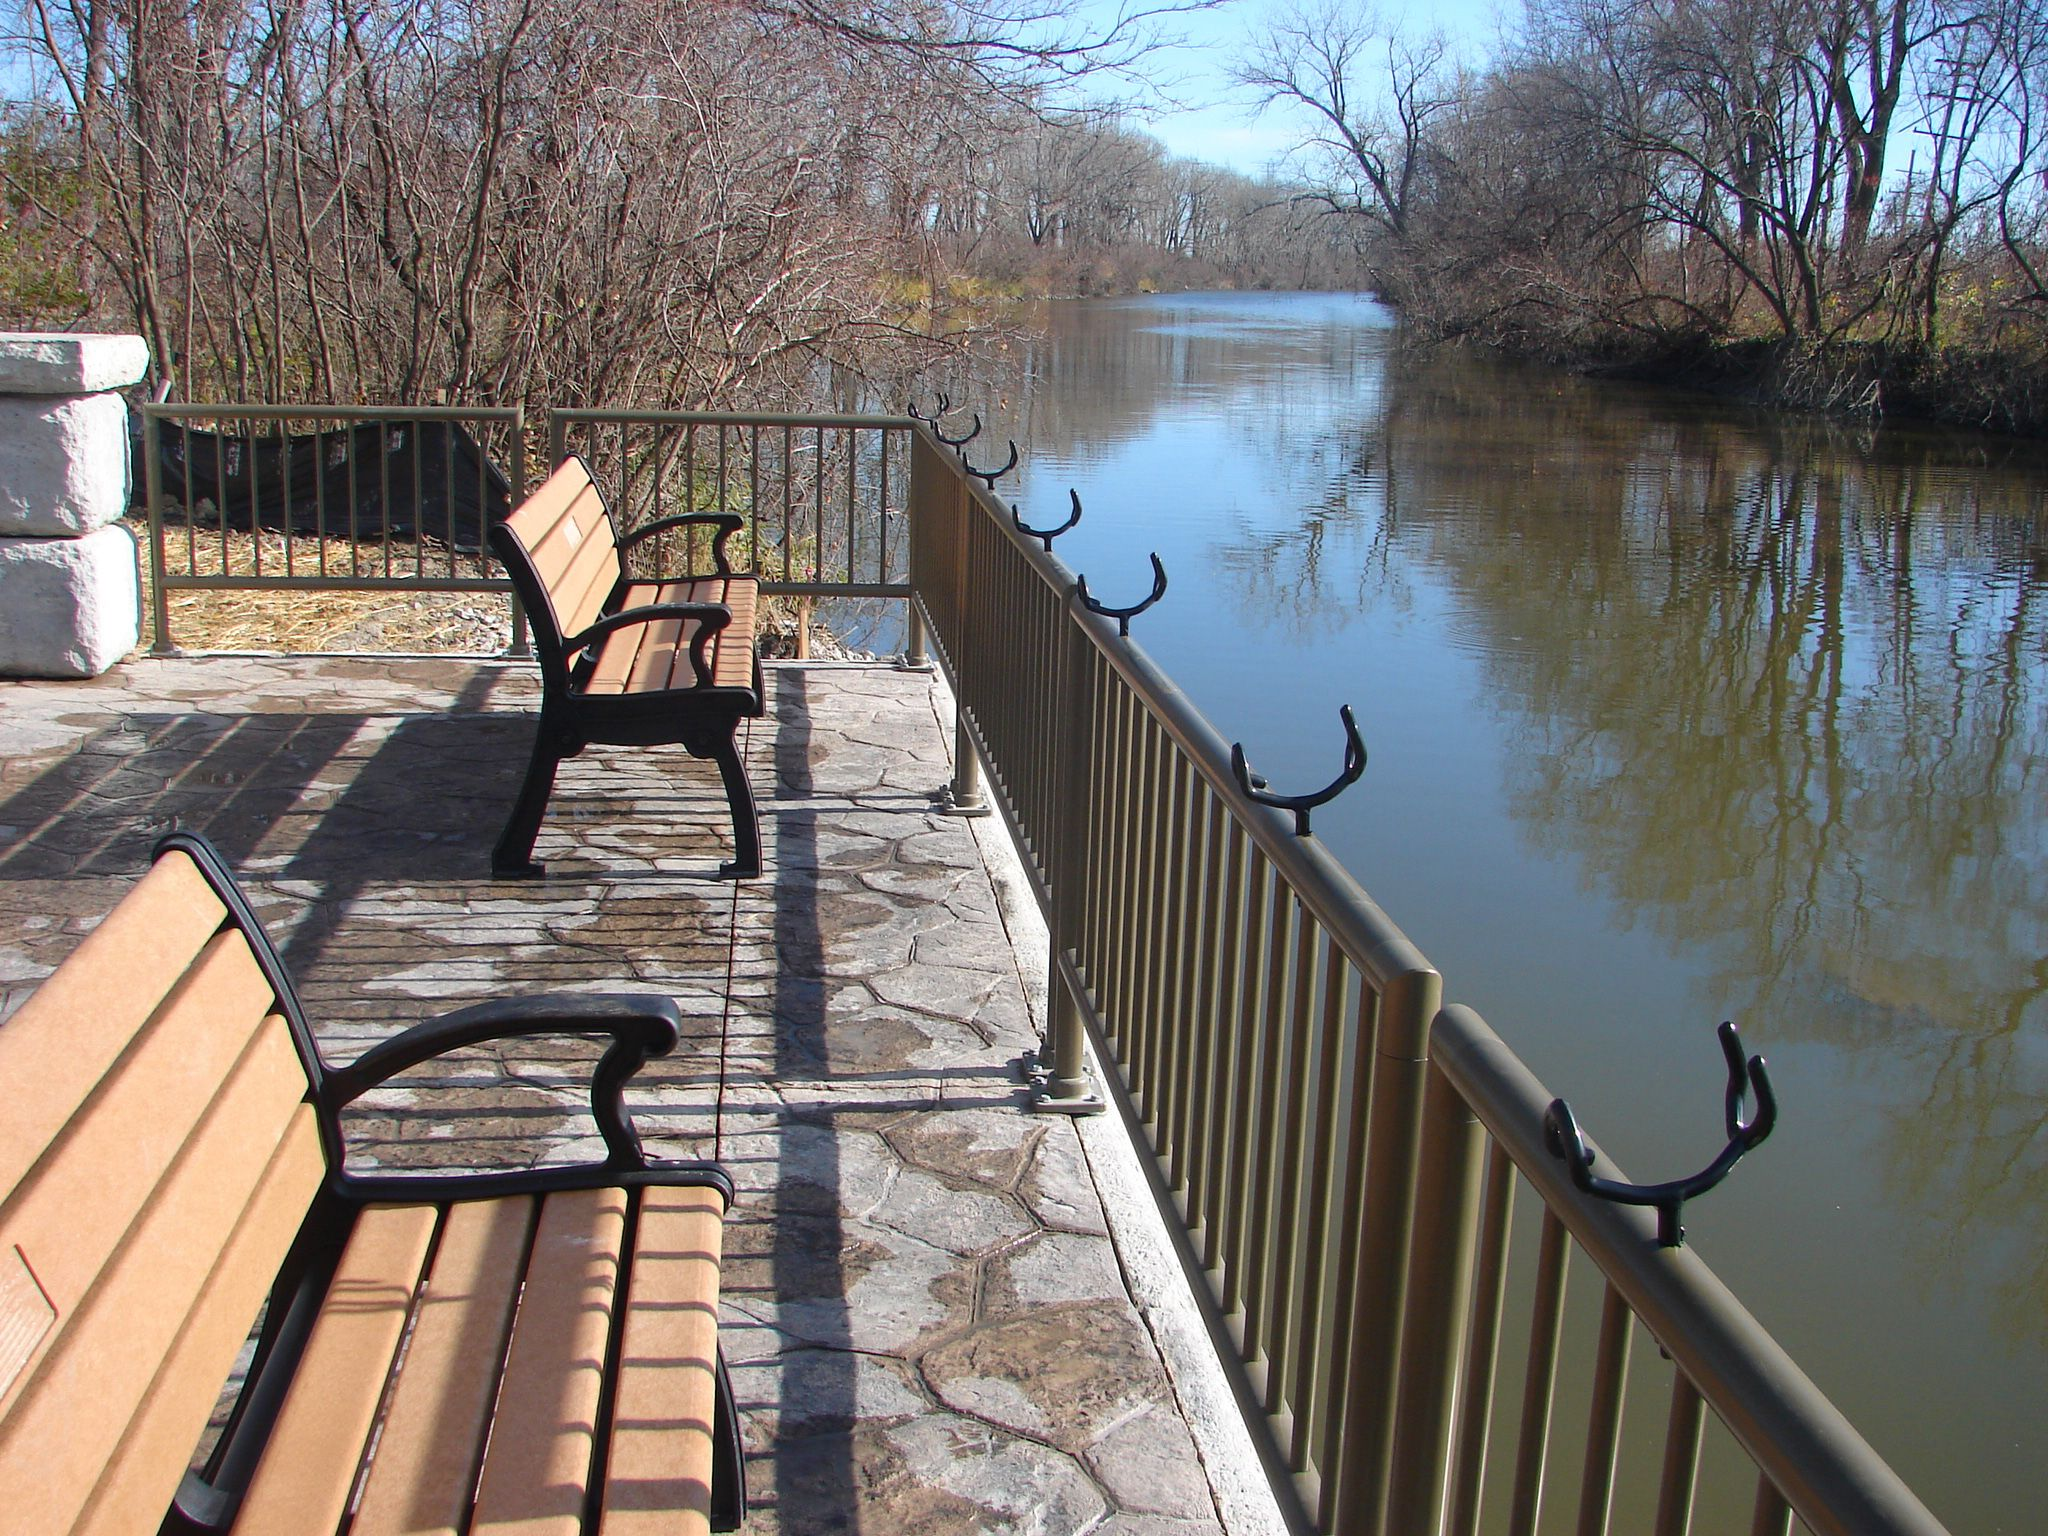 Fishing Pier seating area along River Raisin